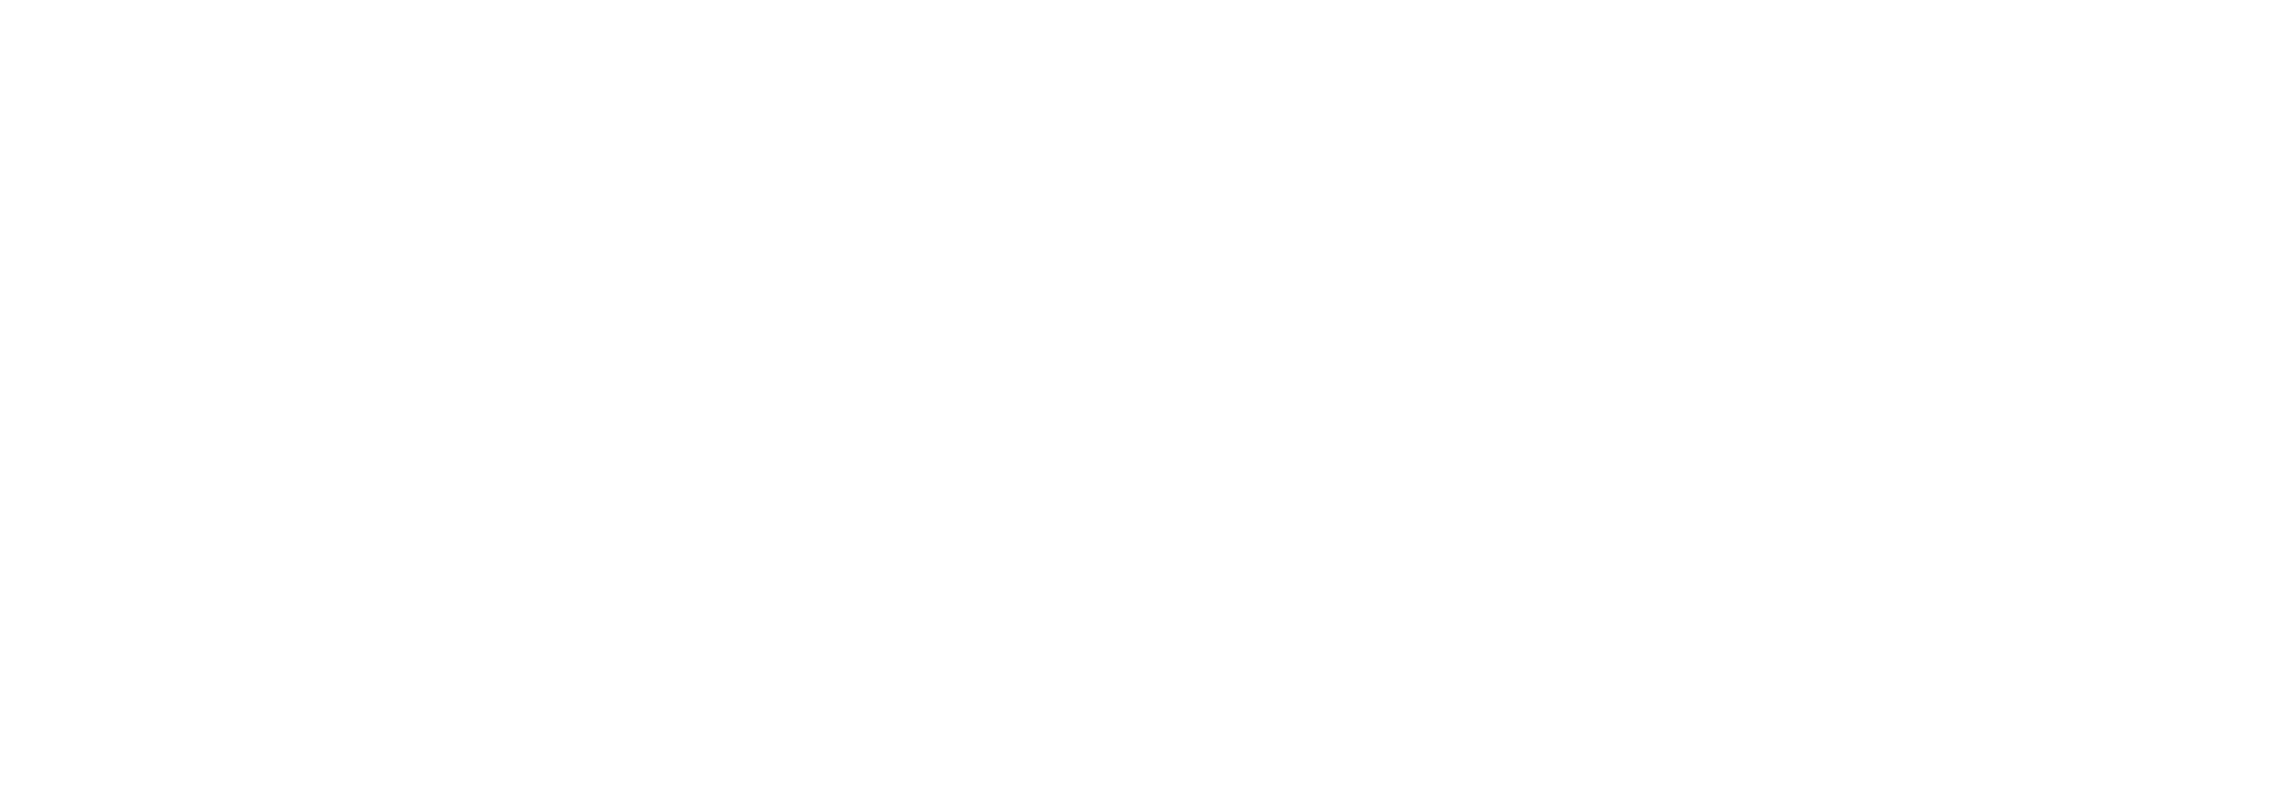 allto building ver2.0-text